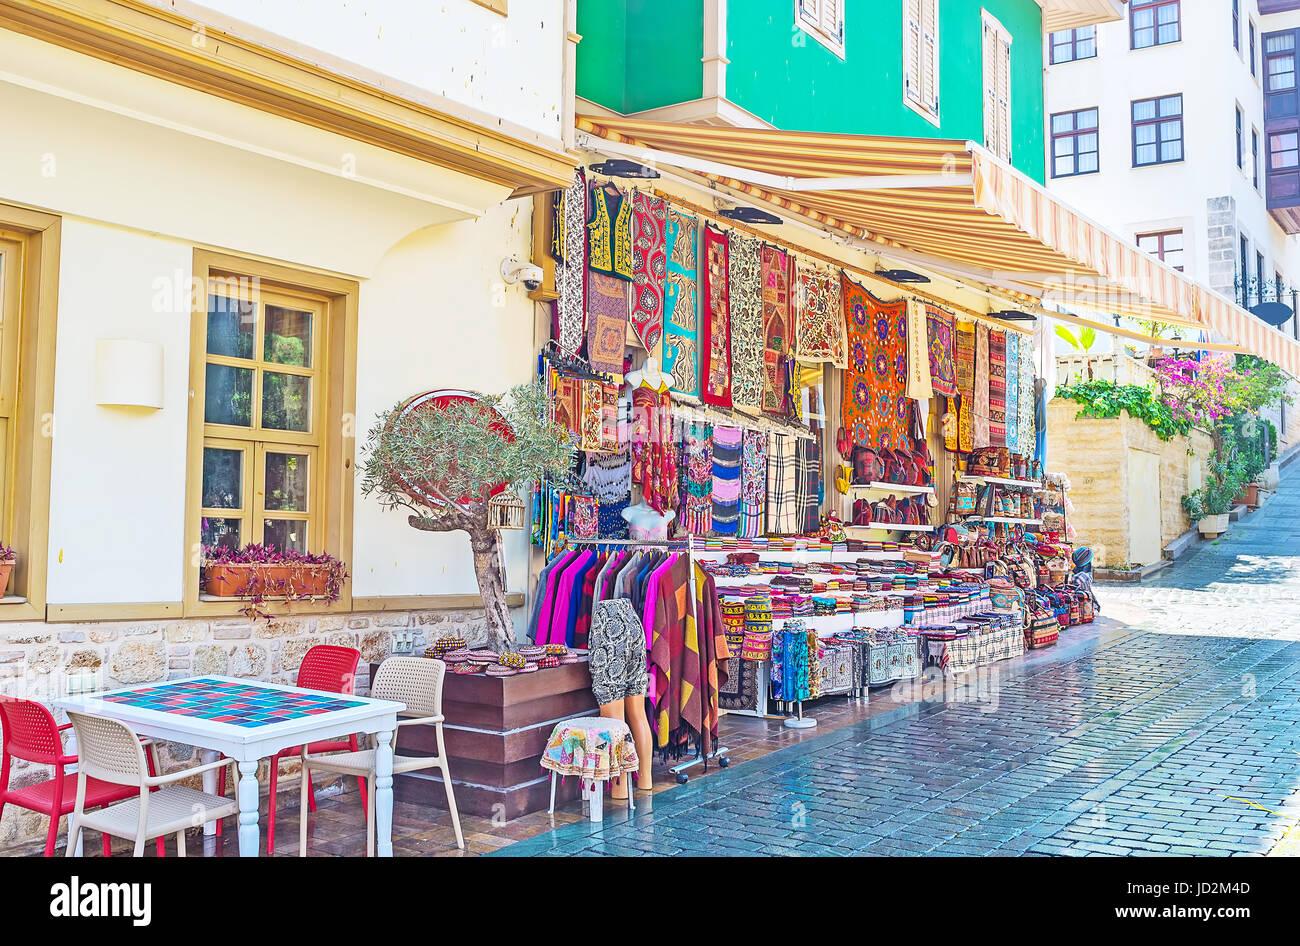 Stock Photo The souvenir stores of